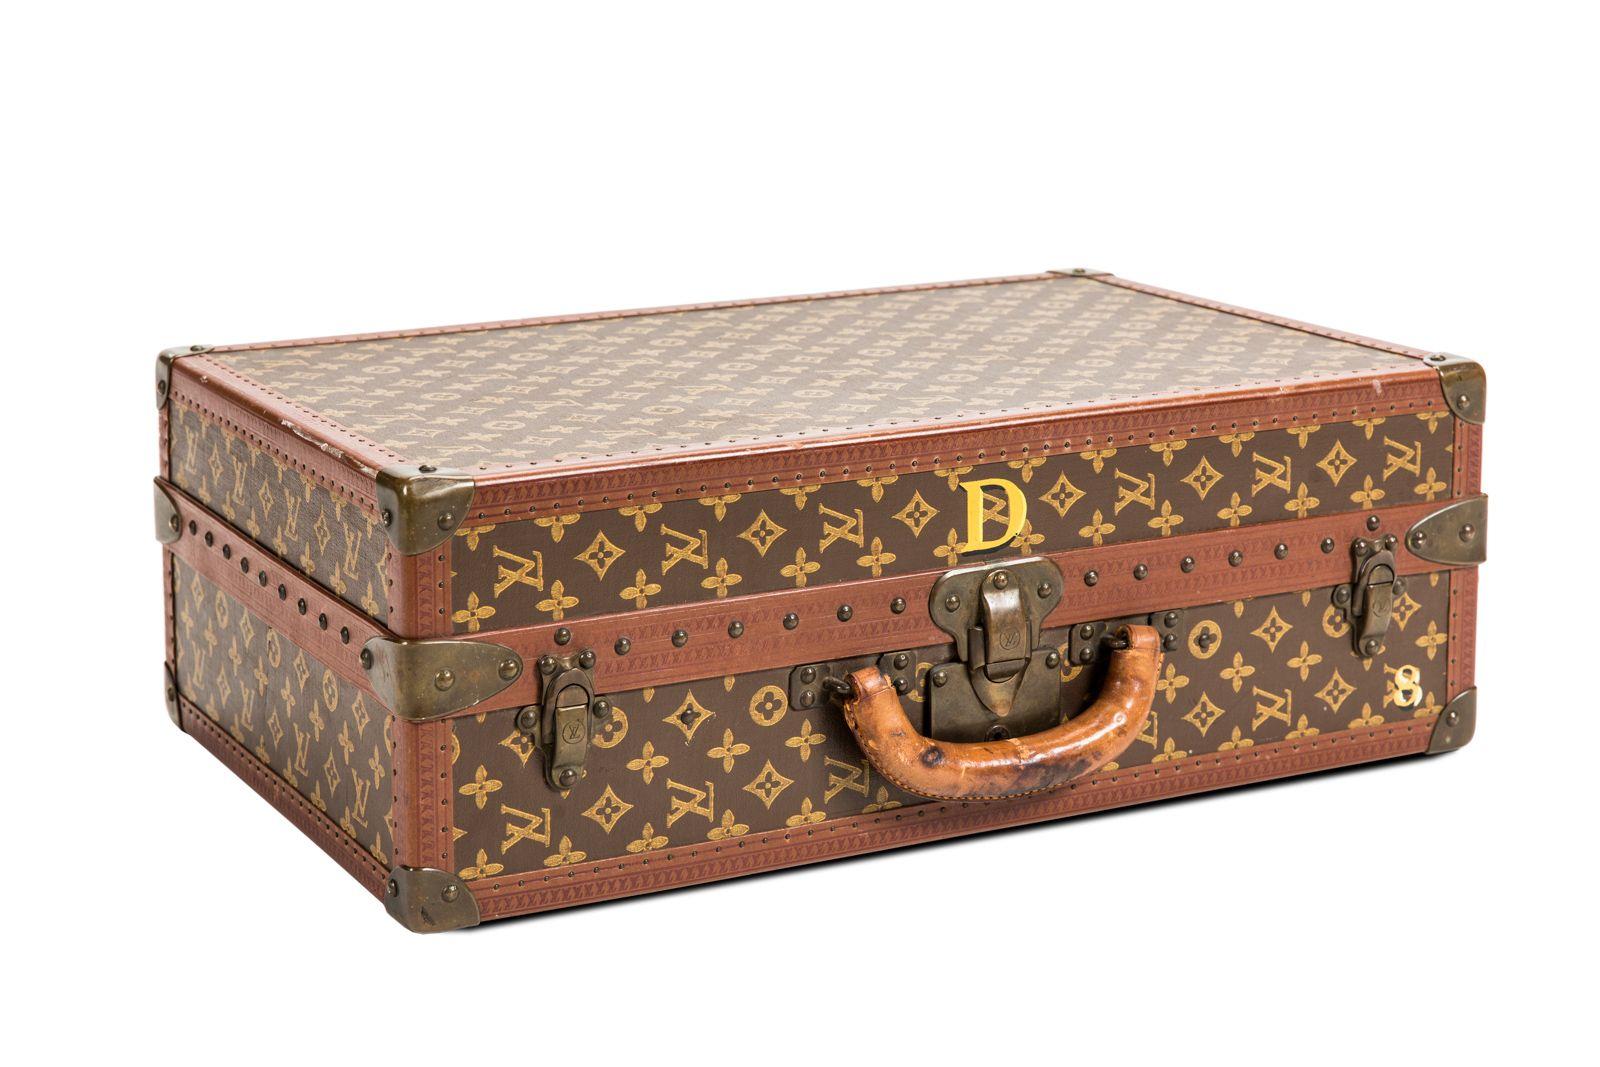 Hermes Trunk Google Search Ad F Louis Vuitton Louis